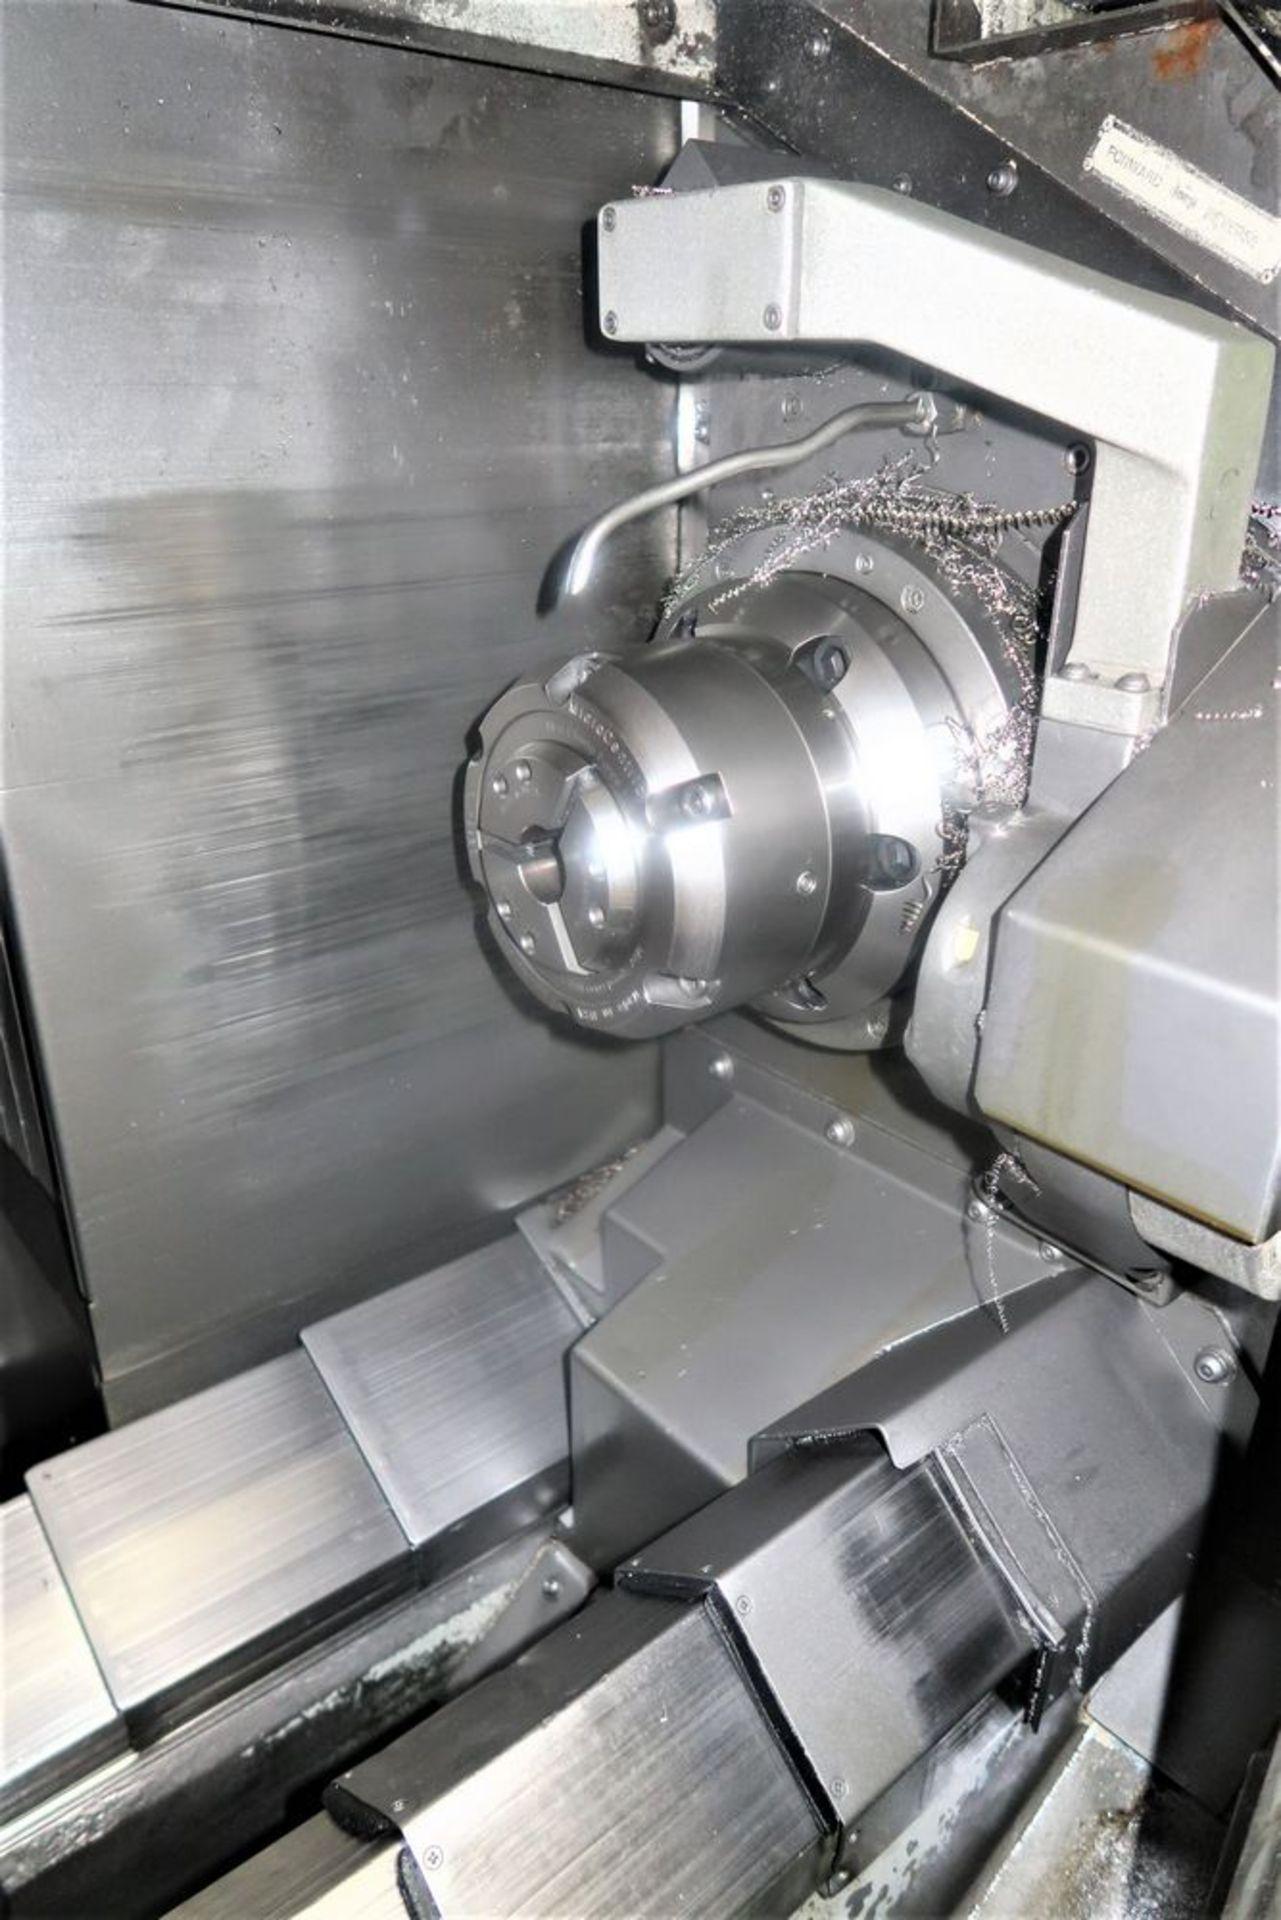 Mazak Dual Turn 25 Twin Spindle CNC Turning Center lathe, S/N 150888 - Image 7 of 13